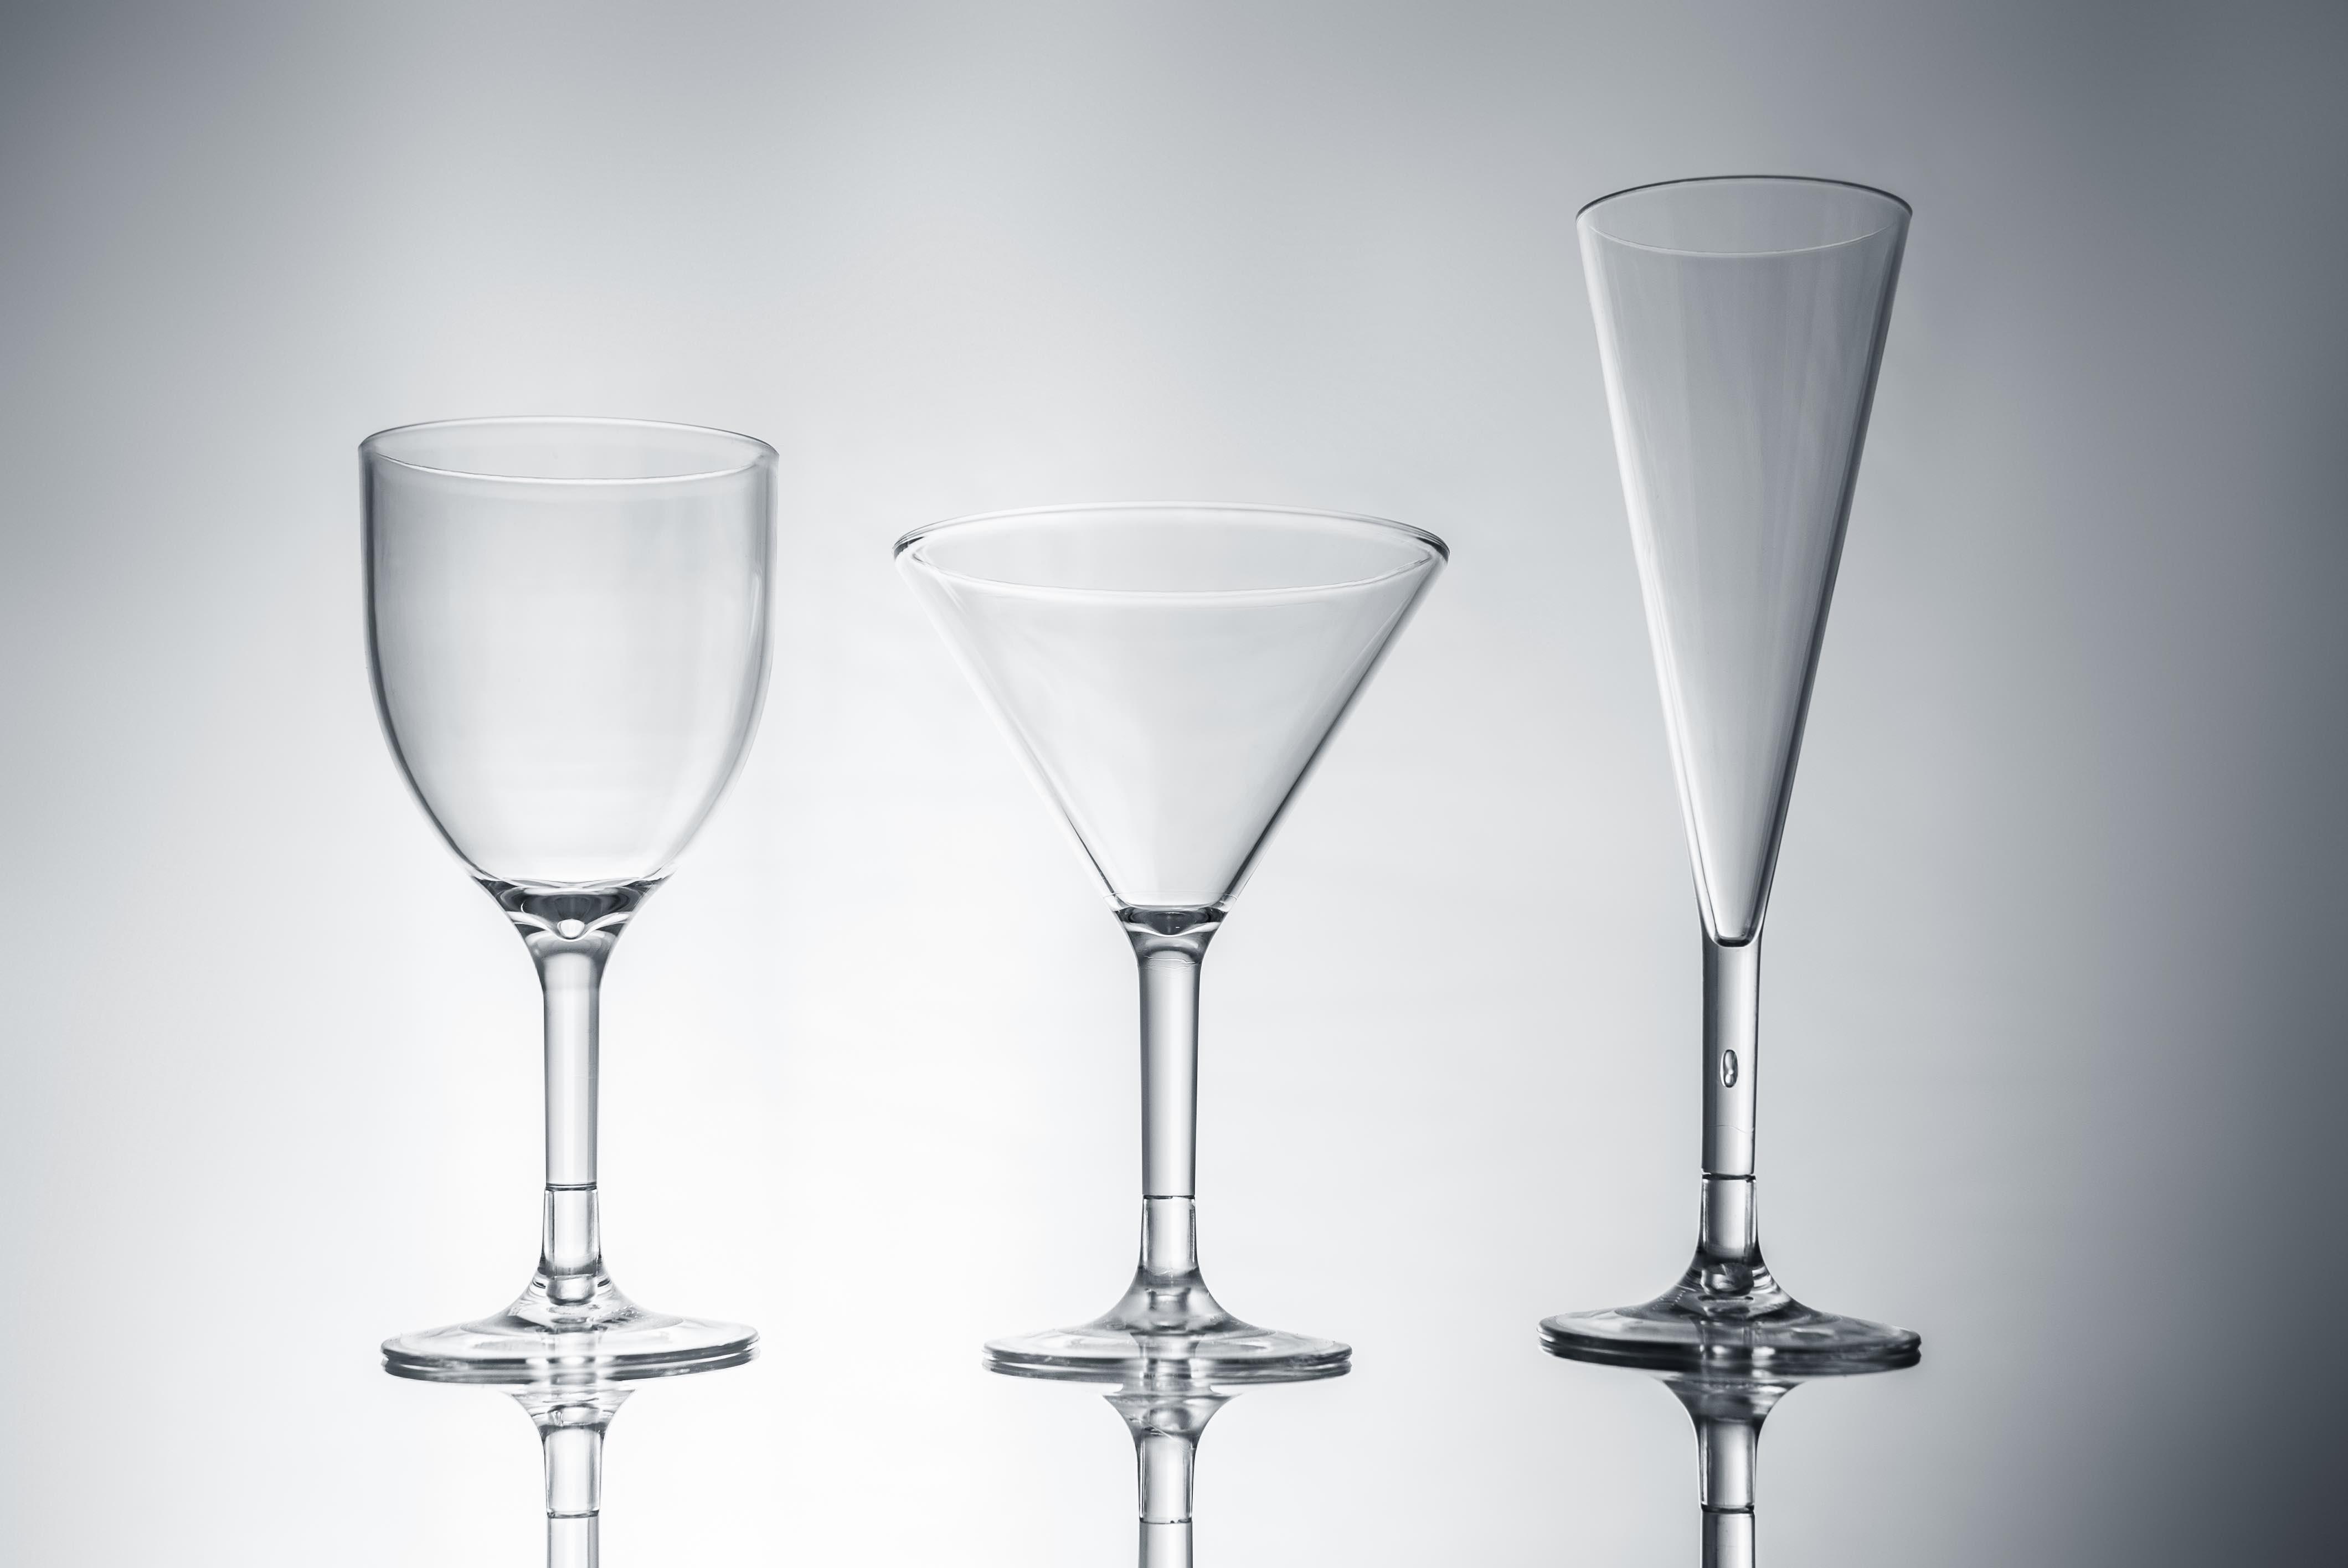 műanyag poharak